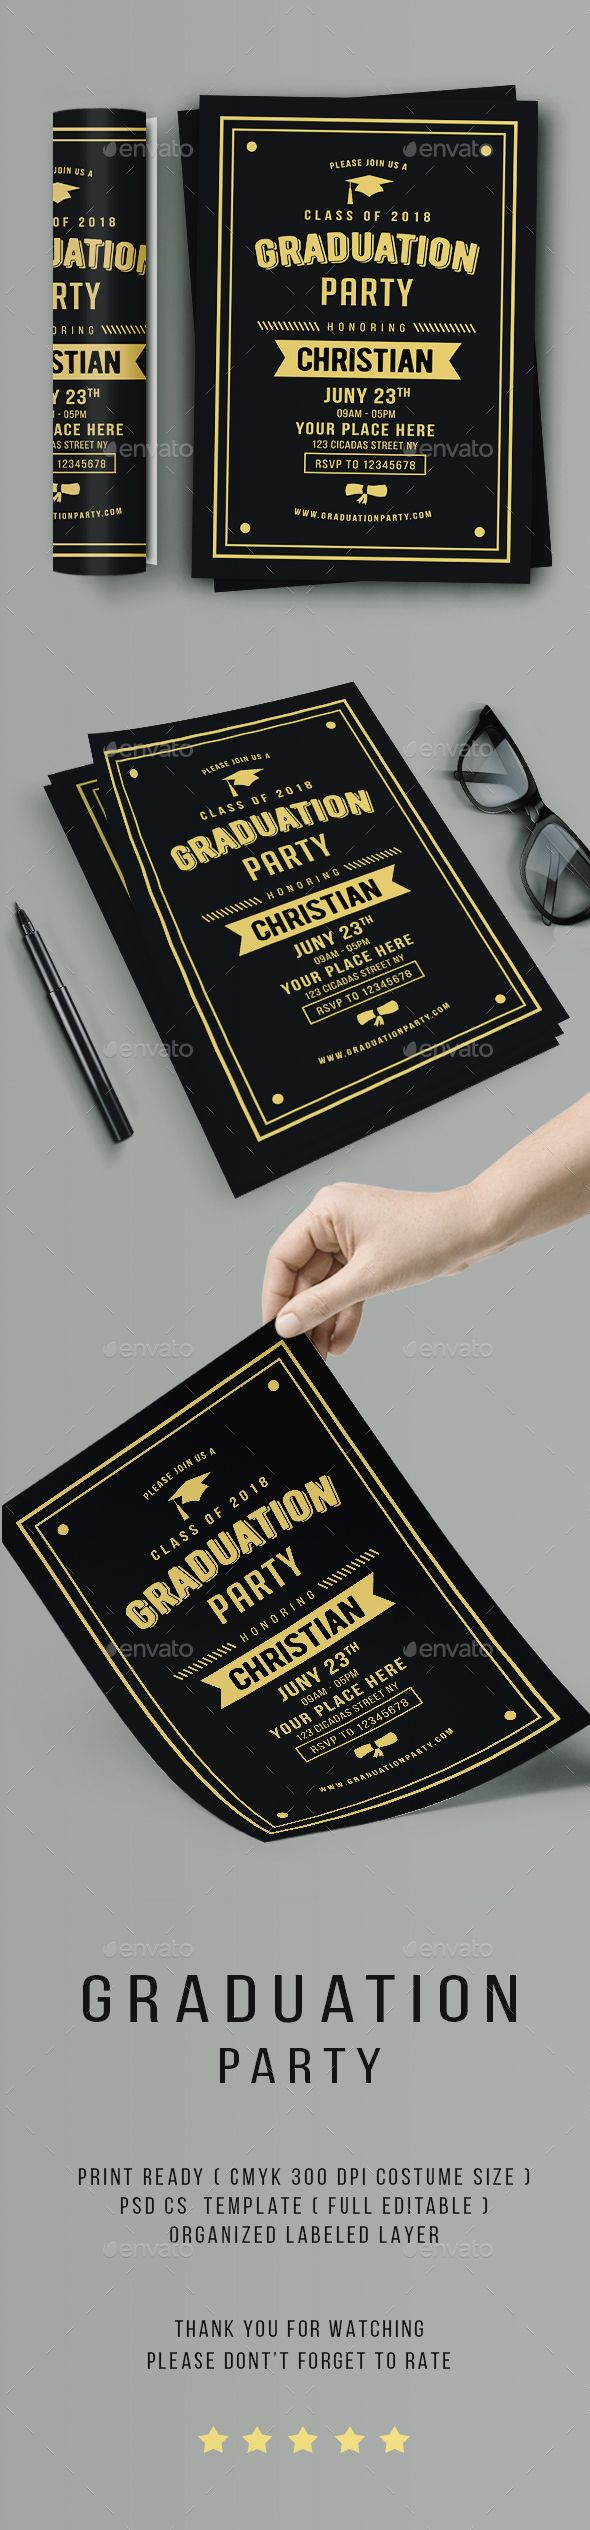 Vintage Graduation Invitation | Vintage, Font logo and Card templates